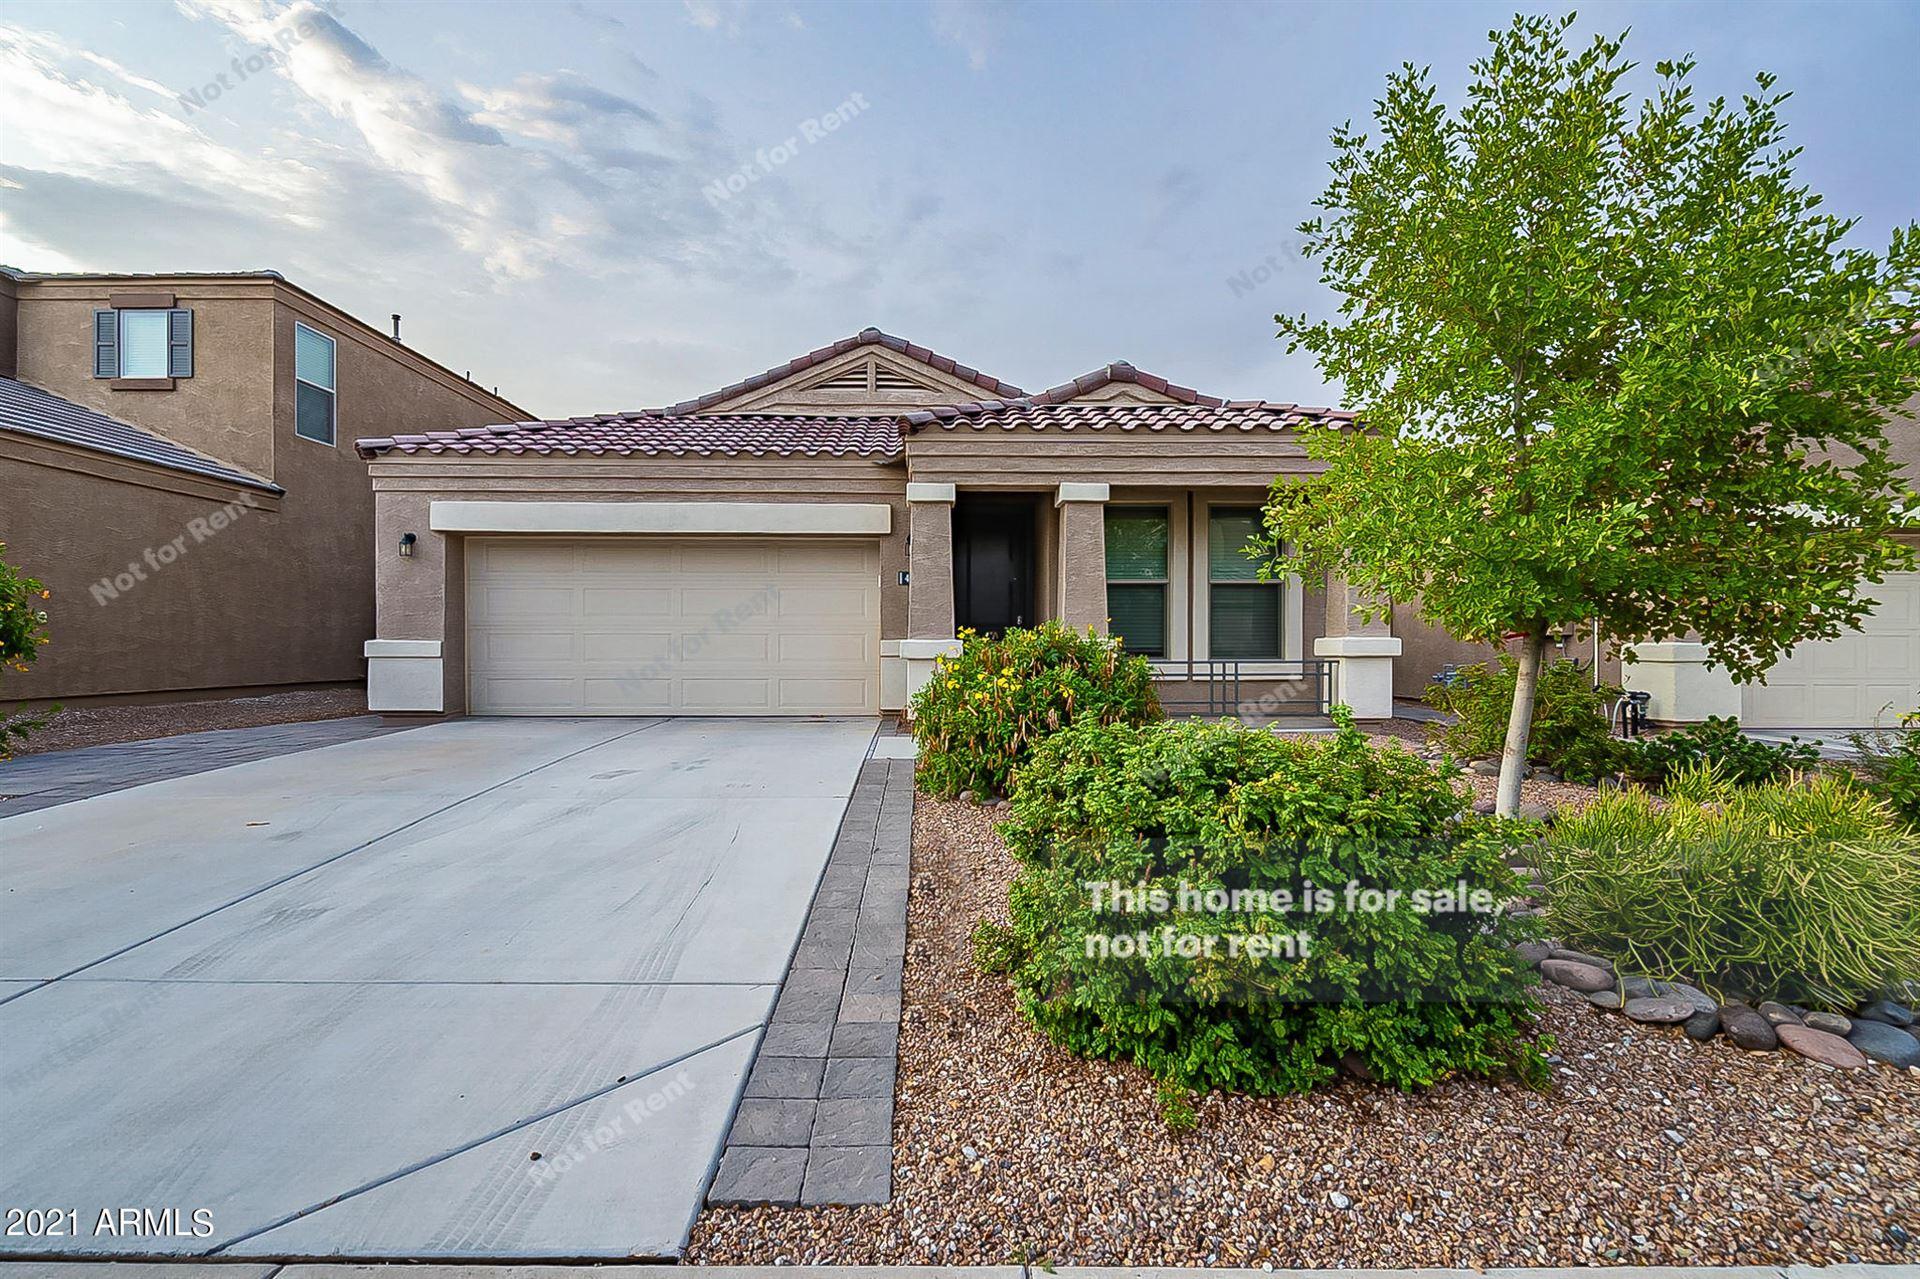 4082 W ALABAMA Lane, Queen Creek, AZ 85142 - MLS#: 6265613